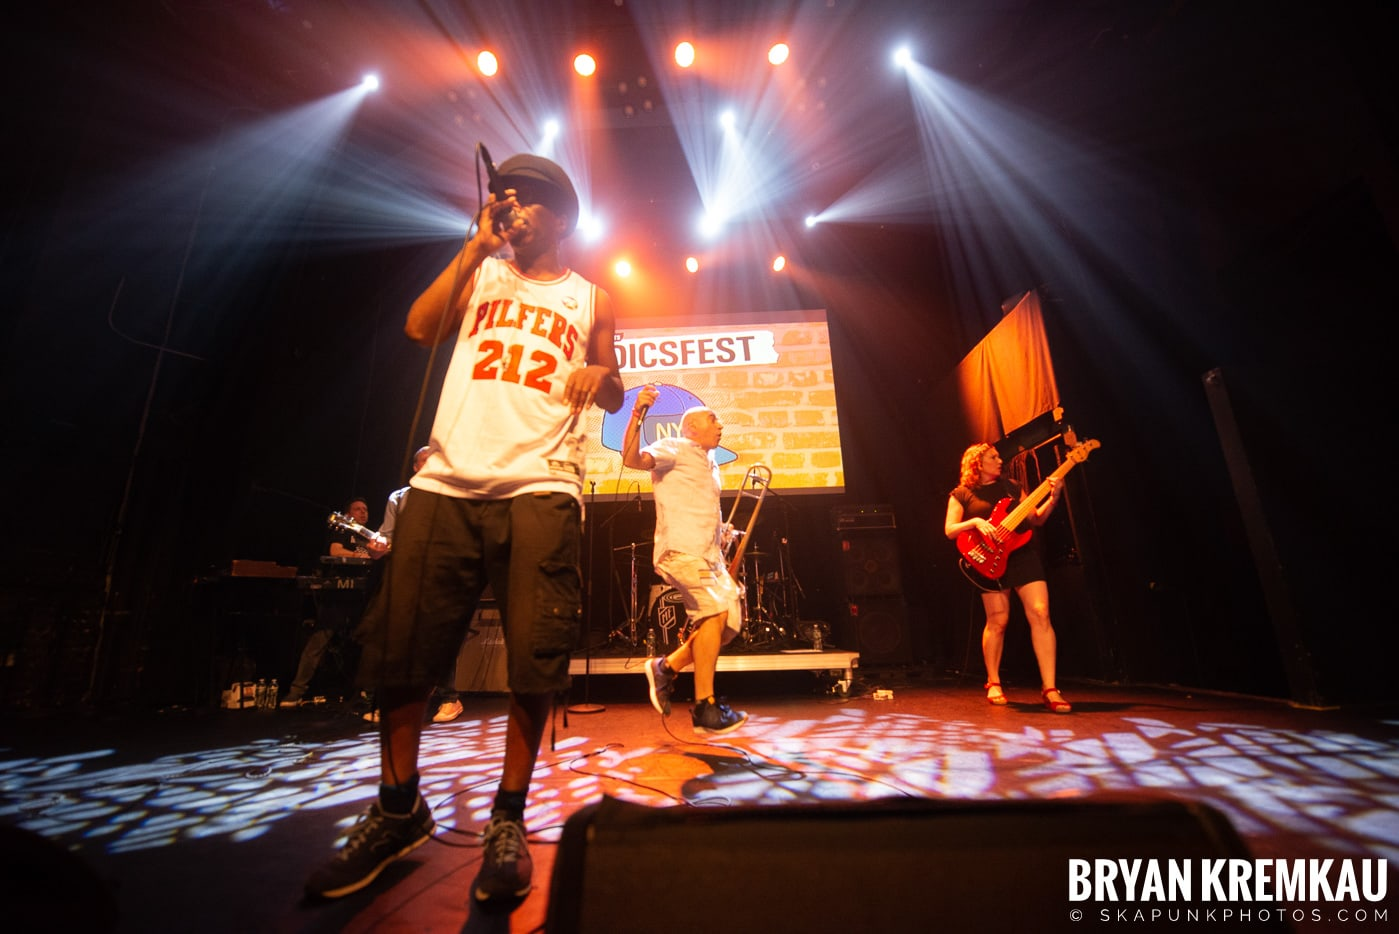 Pilfers @ Radicsfest, Gramercy Theatre, NYC - 7.19.19 (44)